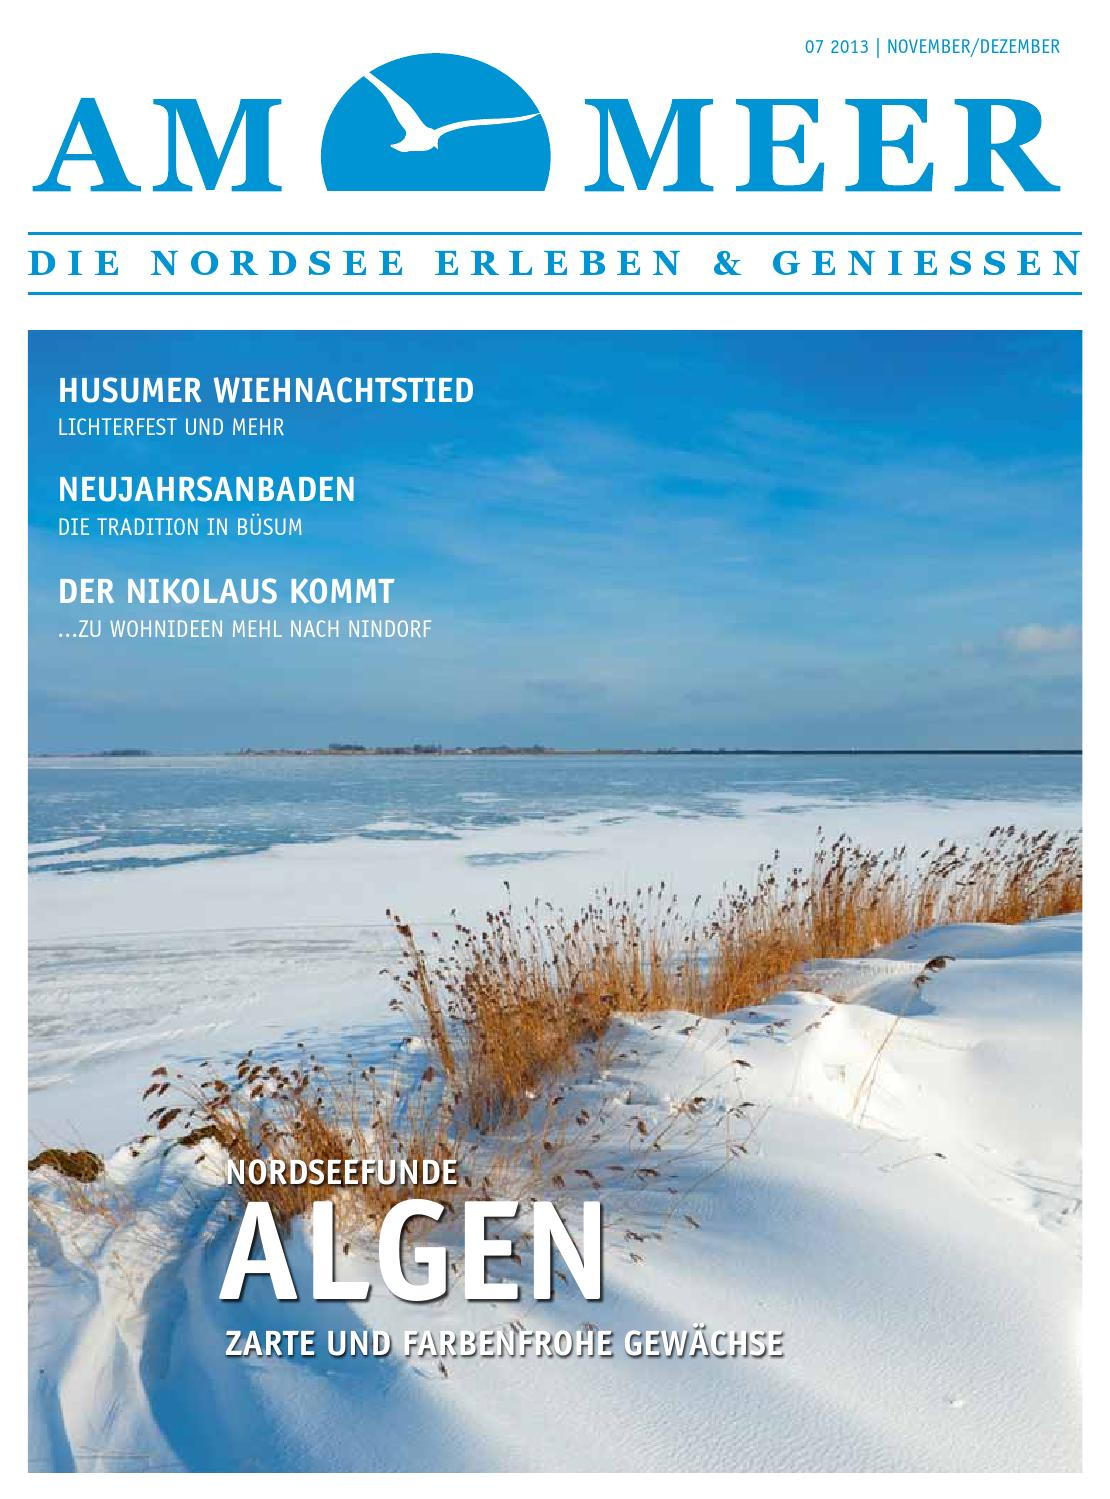 Wohnideen Mehl ammeer112013 by anuschka horns issuu